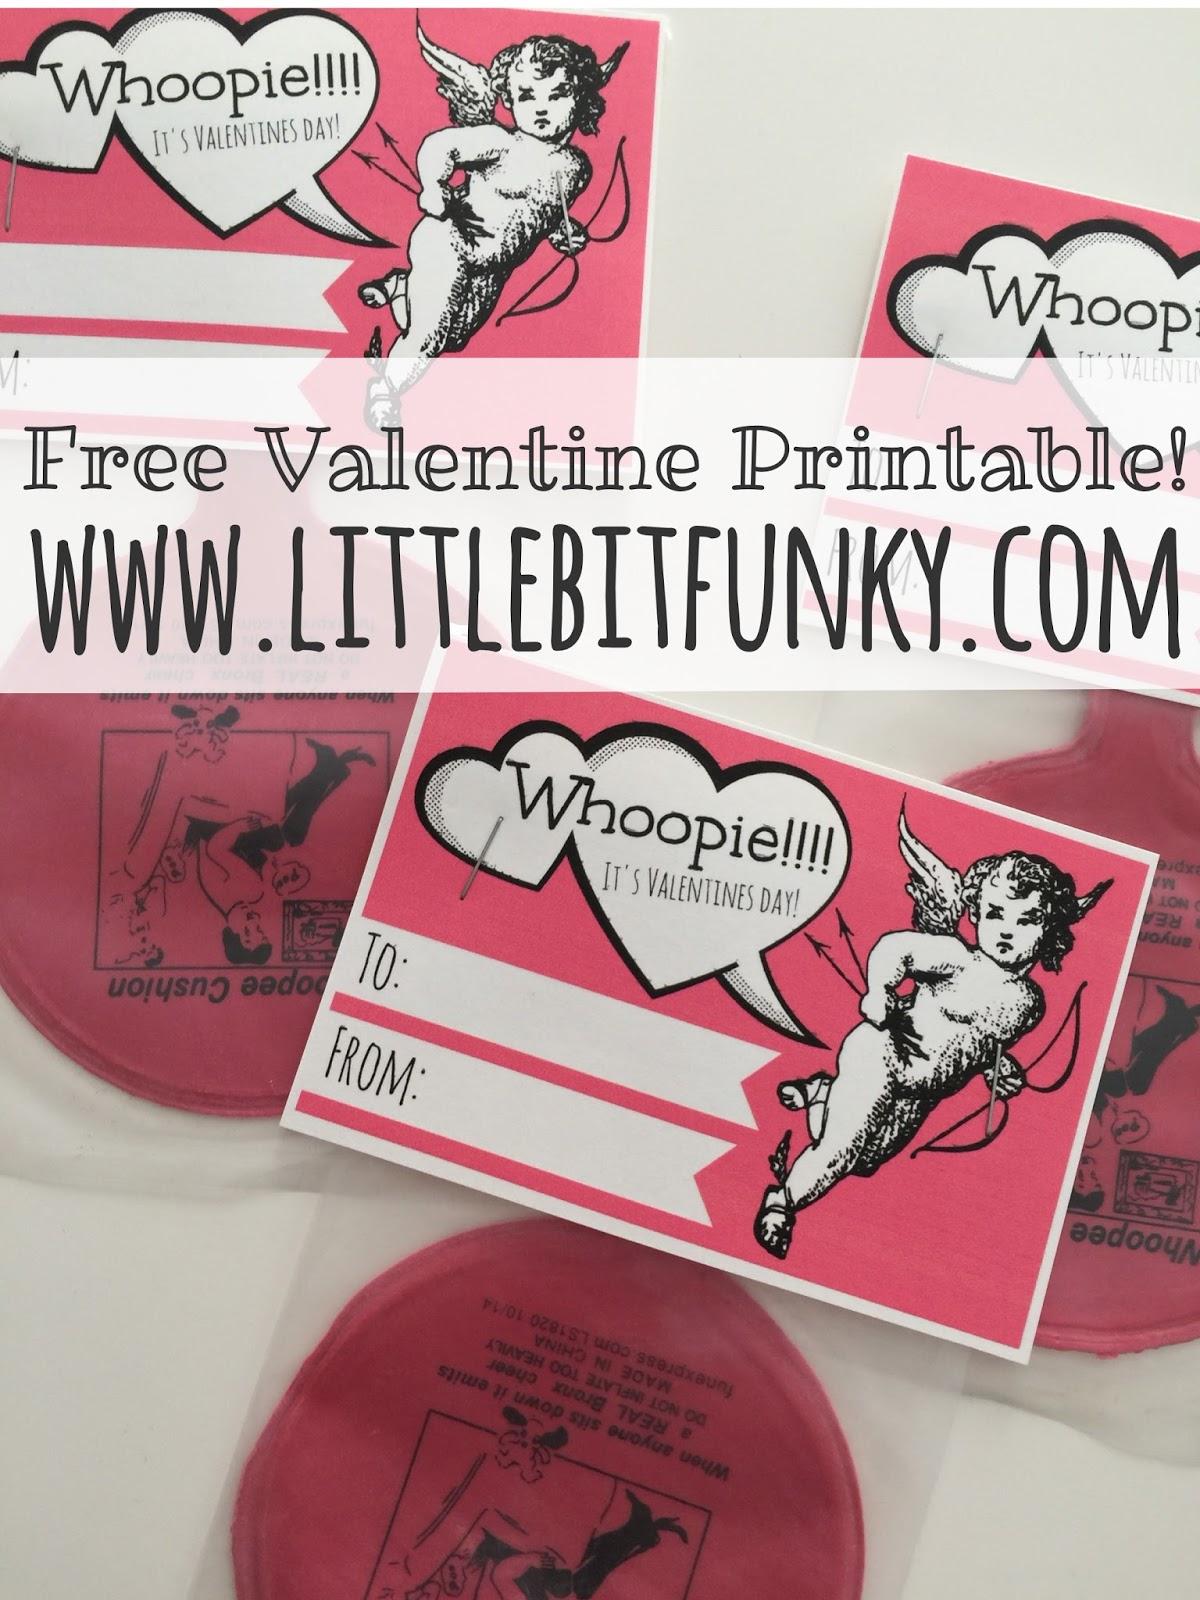 Whoopie! Itu0027s Valentines Day! {a Free Printable}